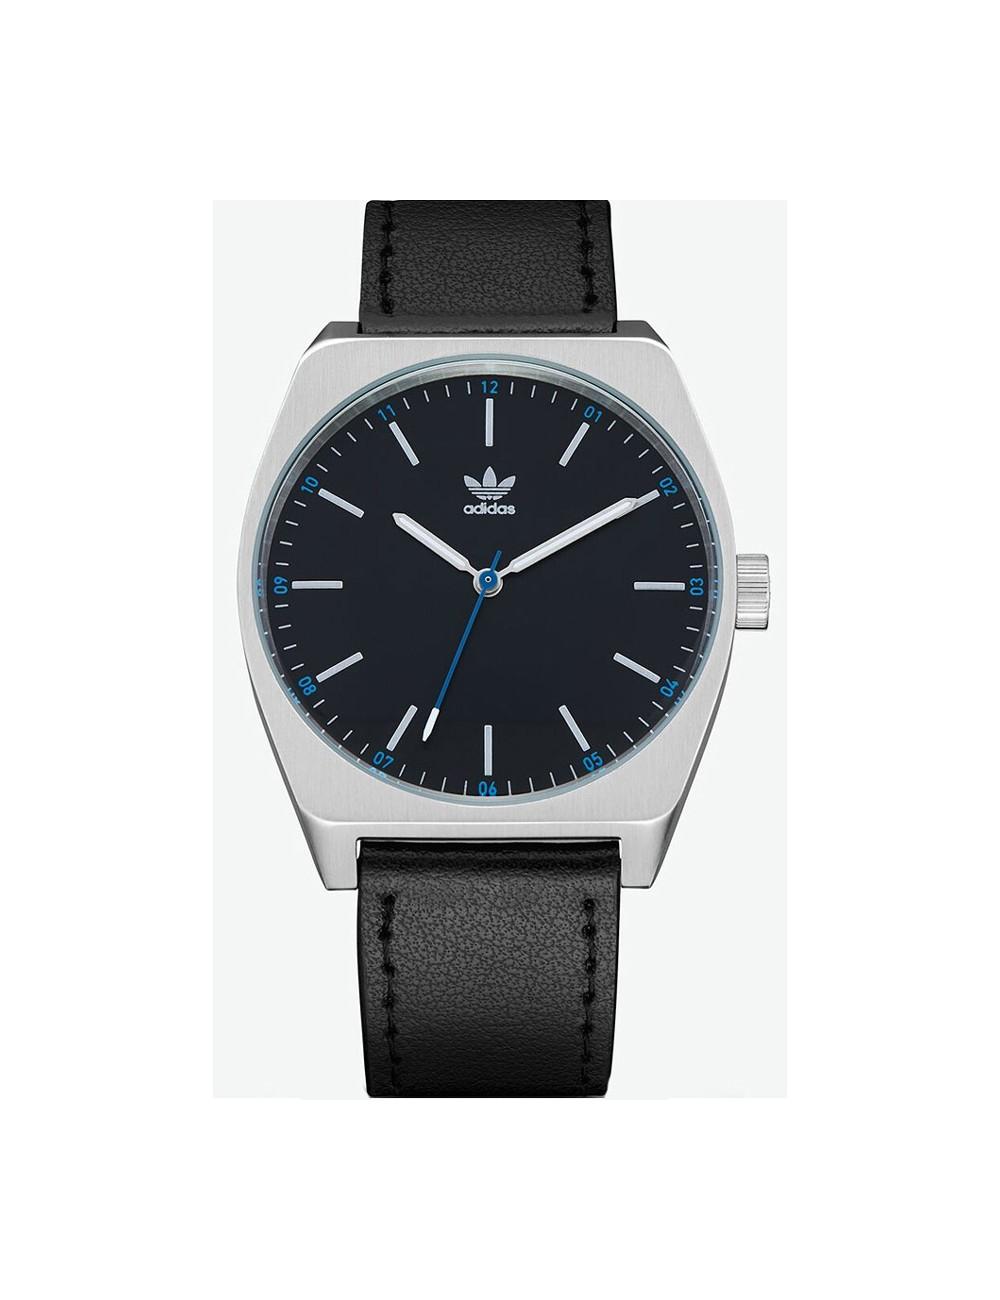 Adidas Process L1 Z05625 Mens Watch